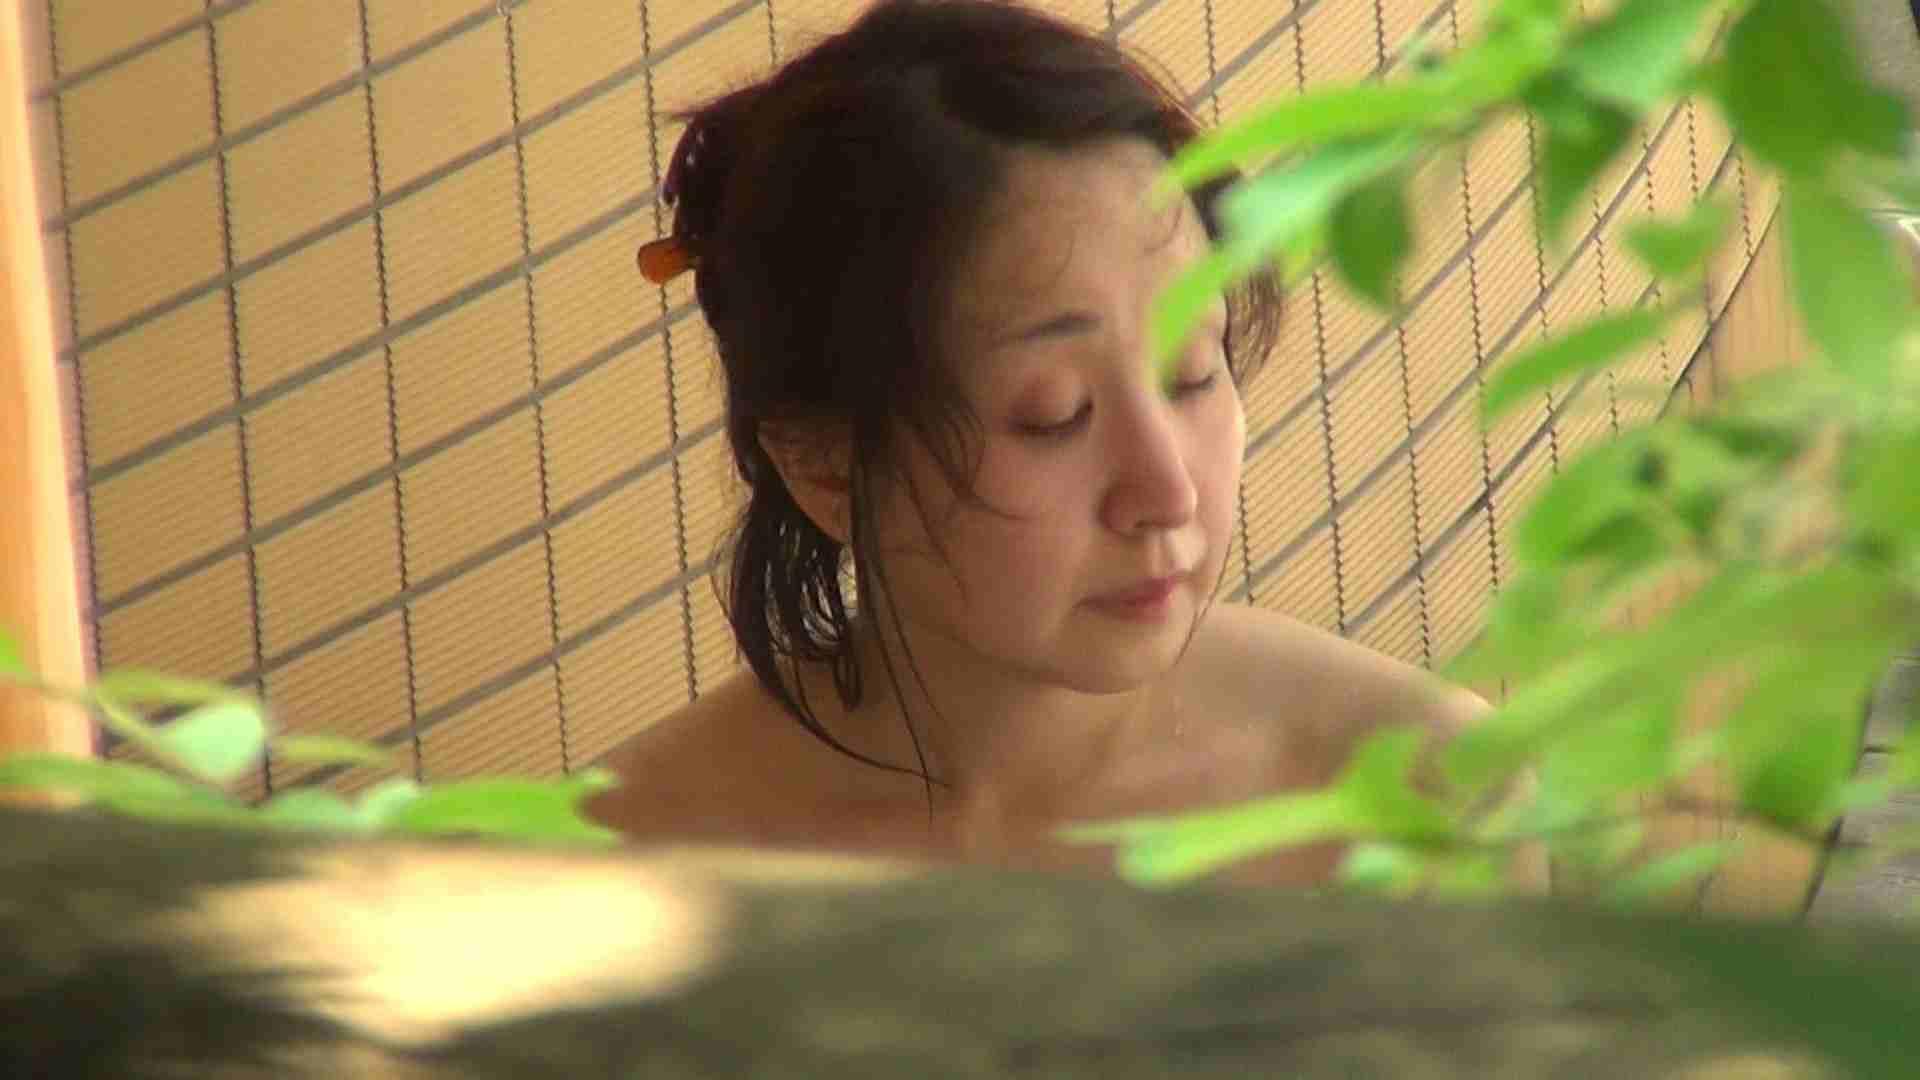 Aquaな露天風呂Vol.308 盗撮映像  75Pix 19